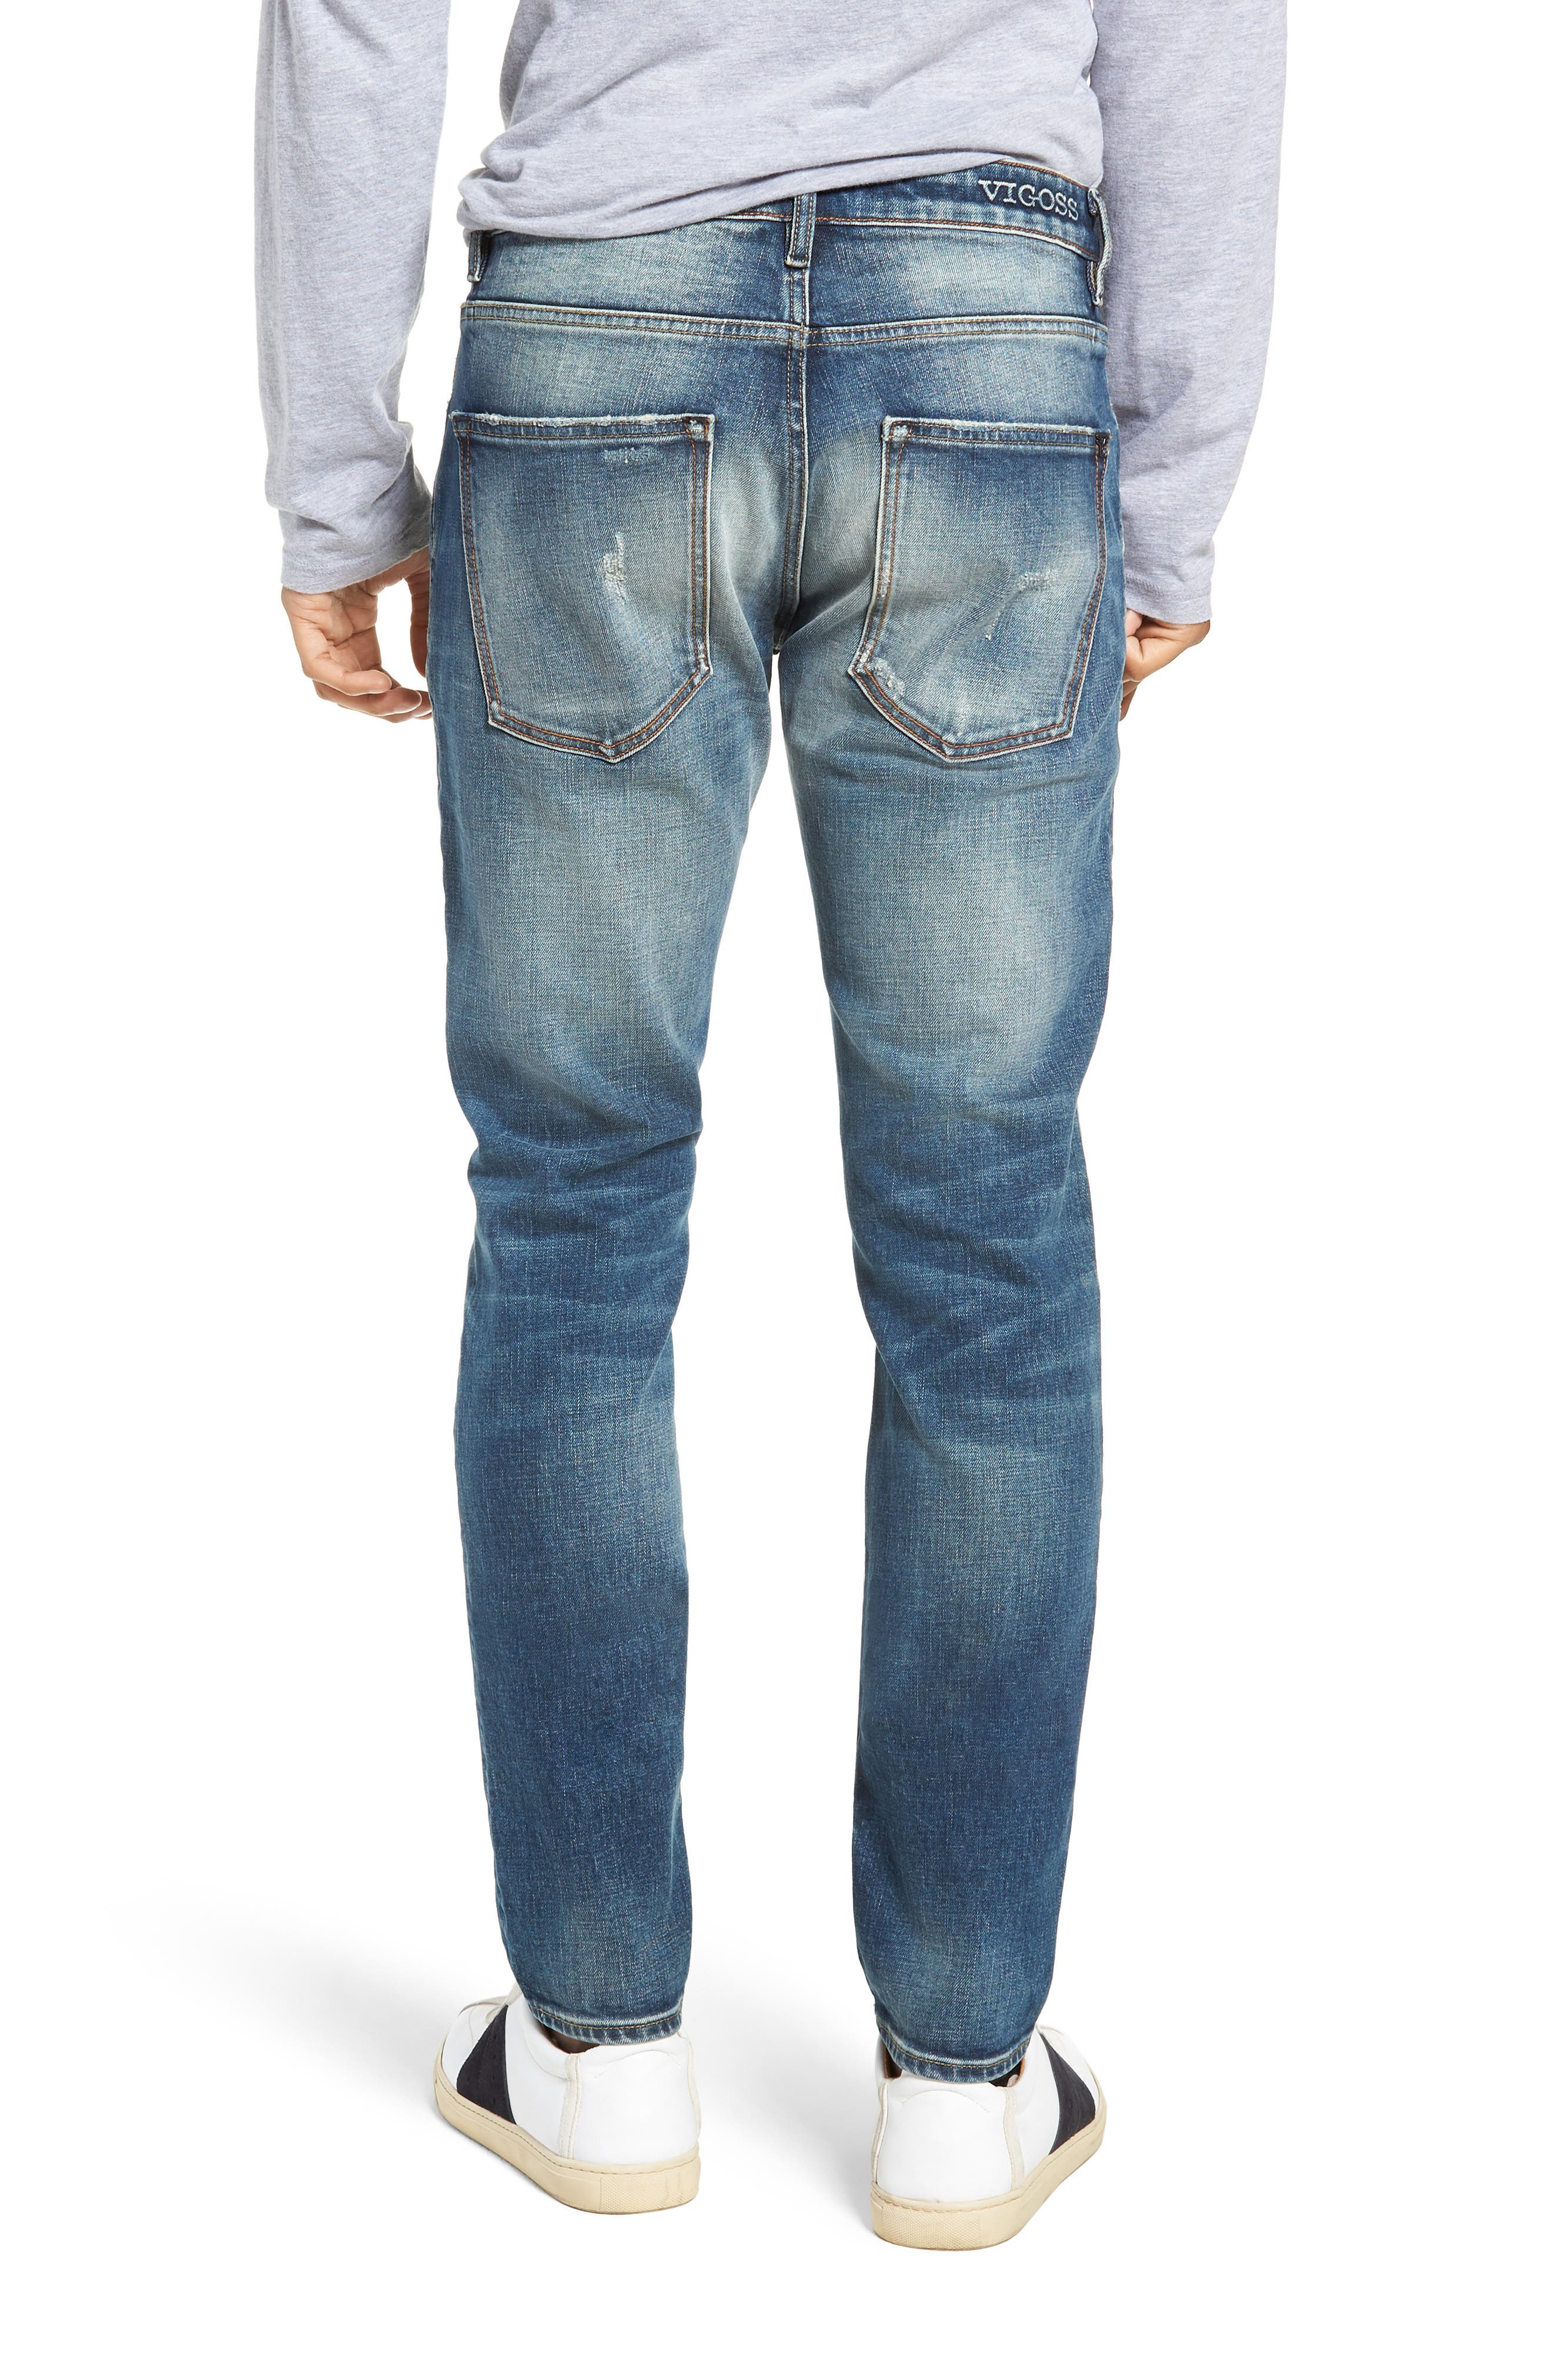 Mick Slim Fit Jeans,                             Alternate thumbnail 2, color,                             VINTAGE WASH